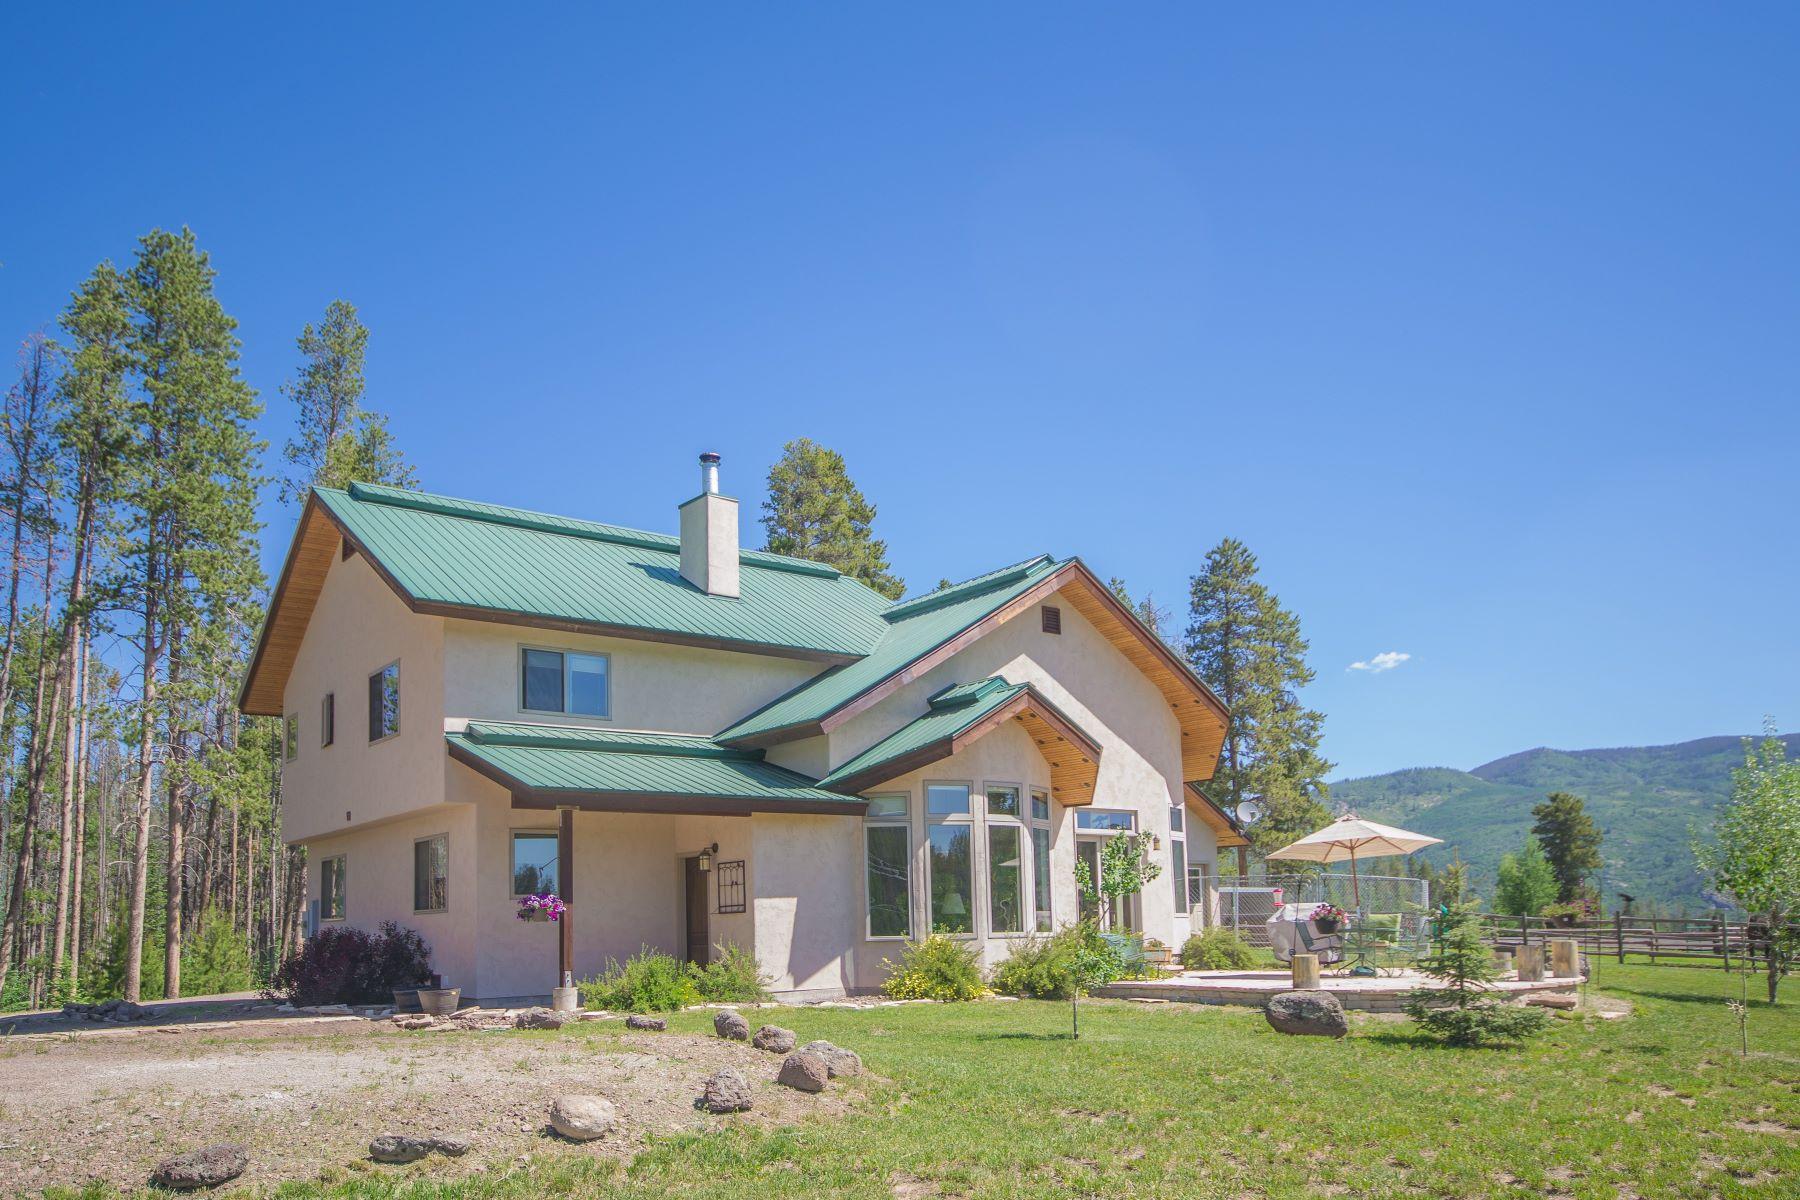 واحد منزل الأسرة للـ Sale في Fantastic Steamboat Area Horse Property 21200 County Road 16 Oak Creek, Colorado, 80467 United States